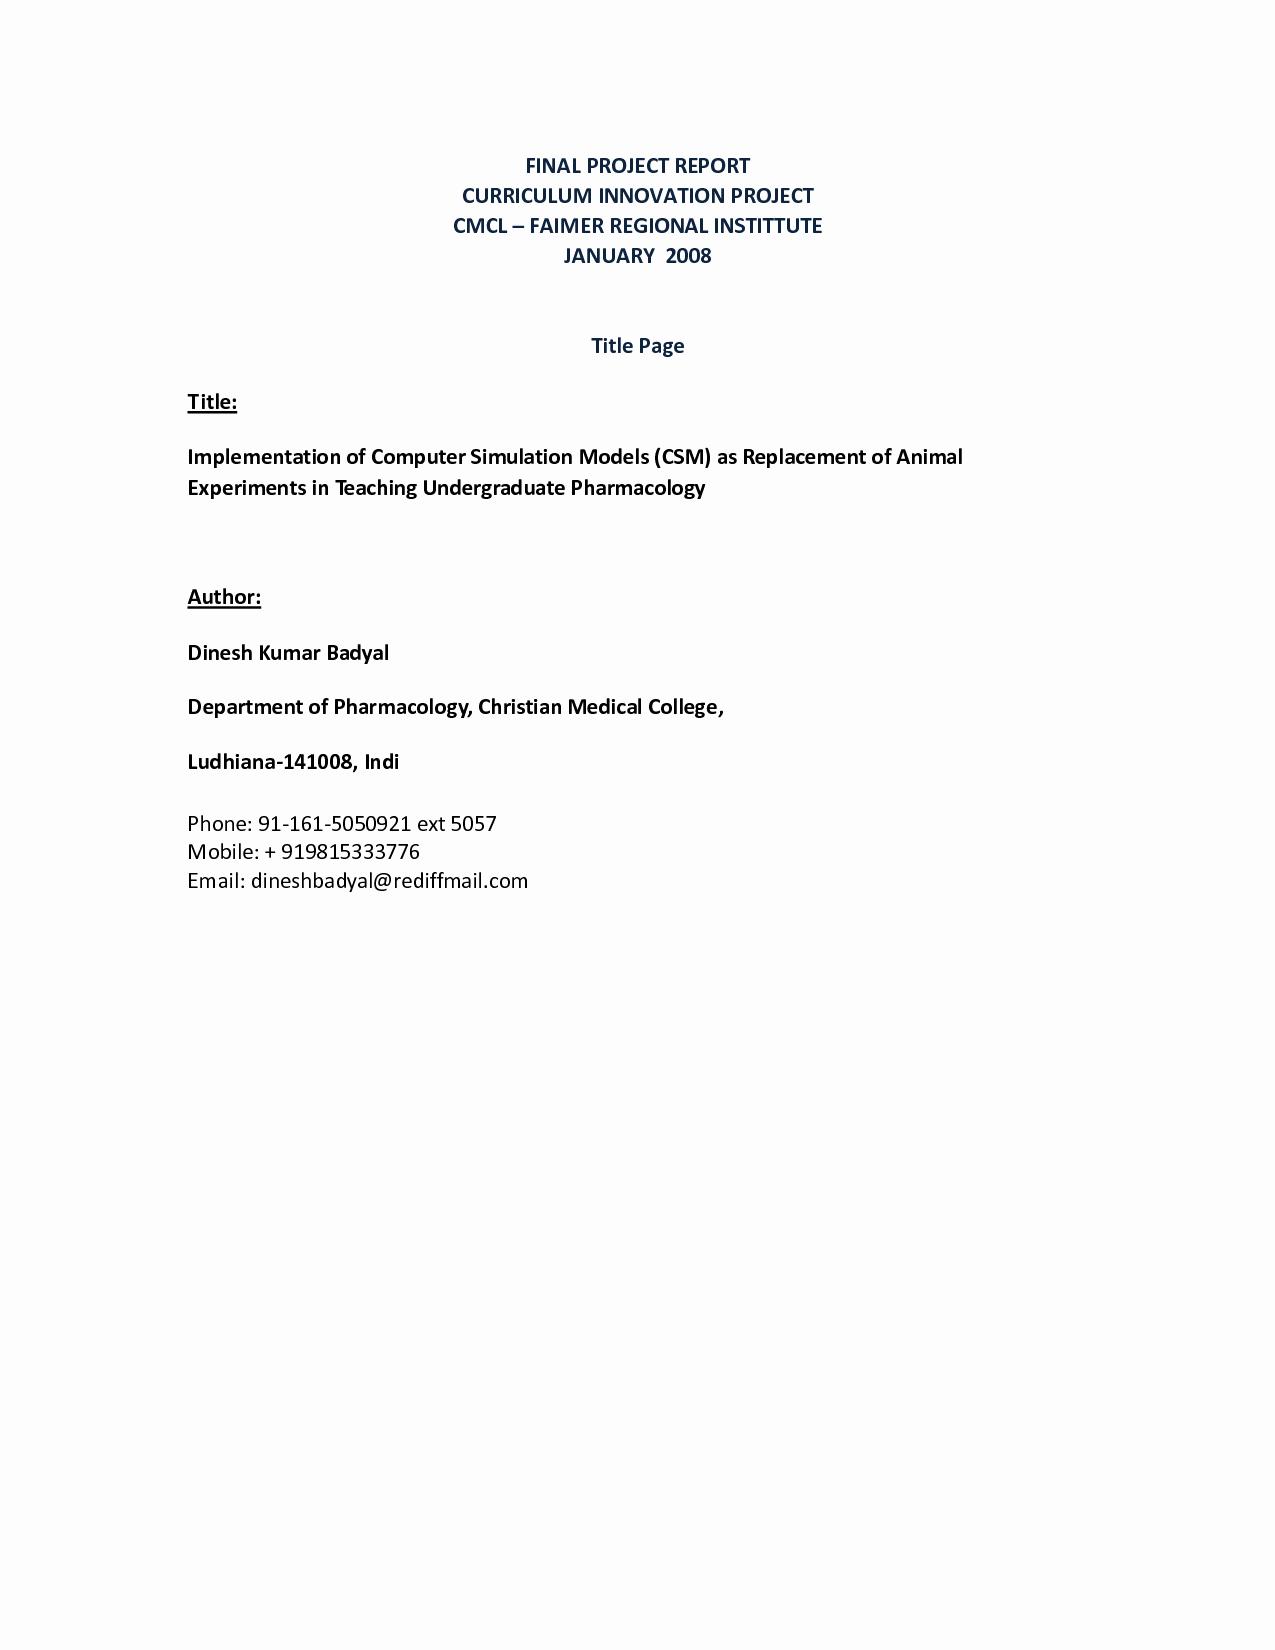 Grant Report Sample Inspirational Best S Of Final Report format Project Report format